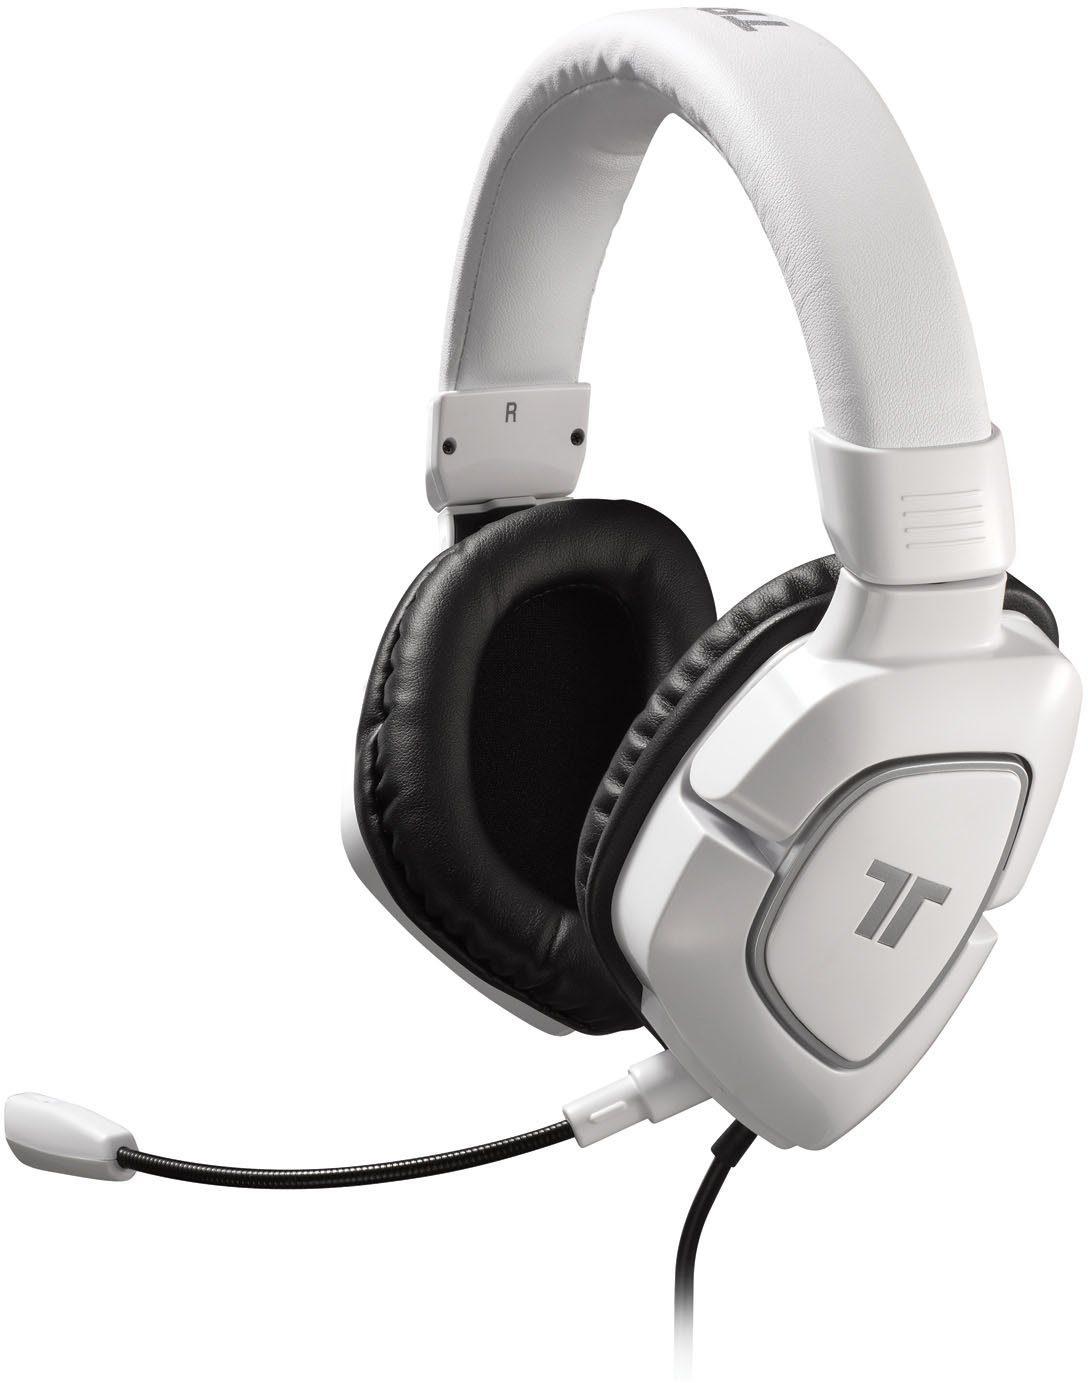 Mad Catz Headset Tritton AX 180 Weiss »(PS3 PC Wii X360)«